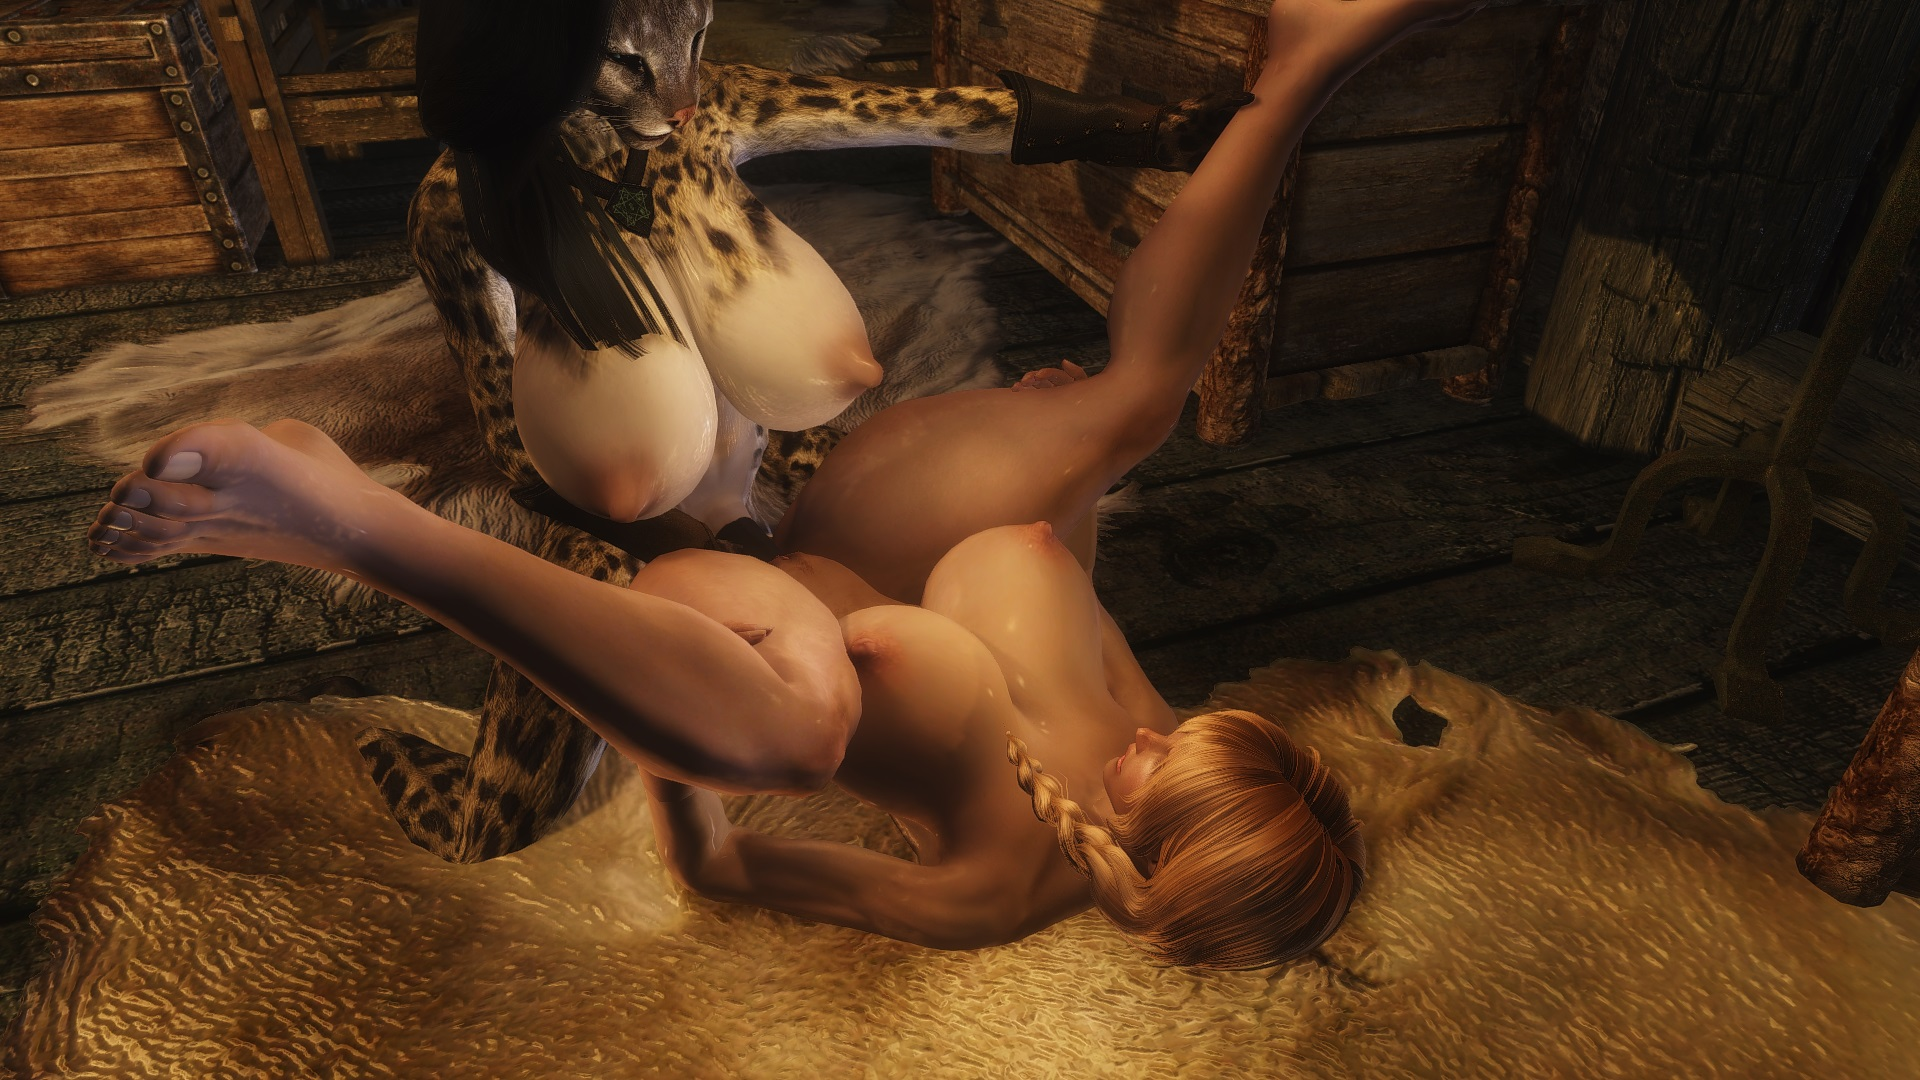 Skyrim Lydia Hentai Hot Girls Wallpaper Hot Grannies Hot XXX Pictures